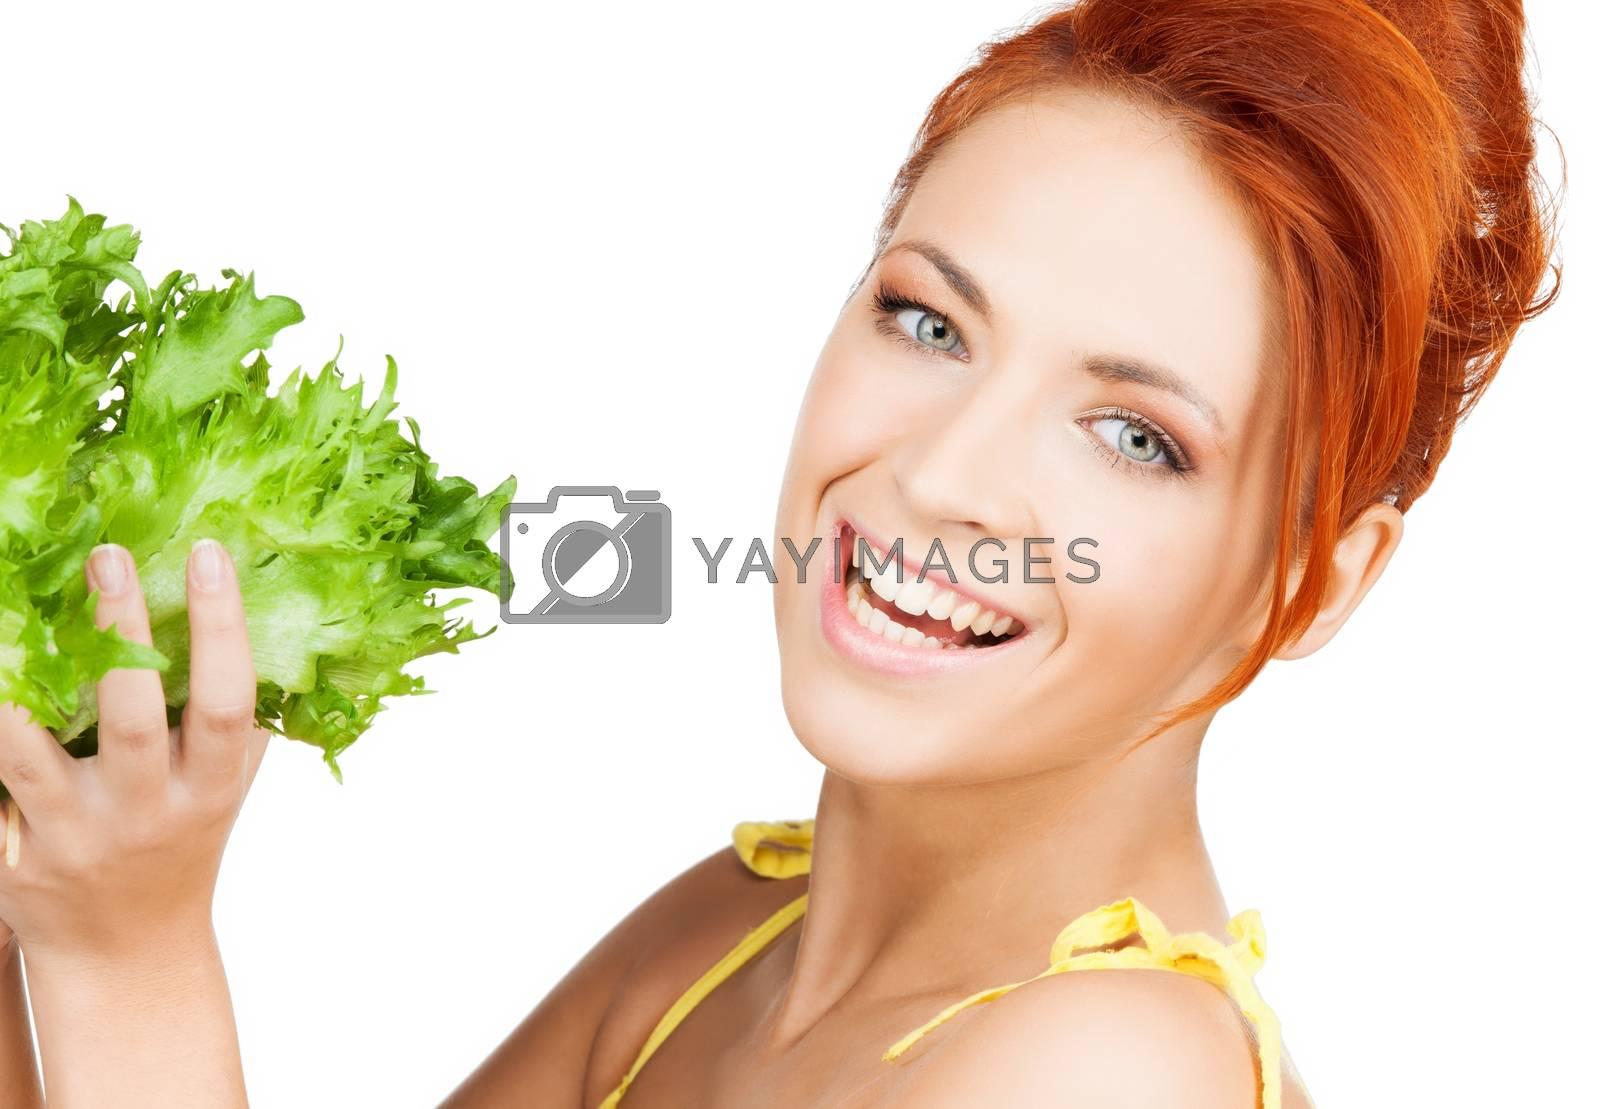 woman holding lettuce by dolgachov